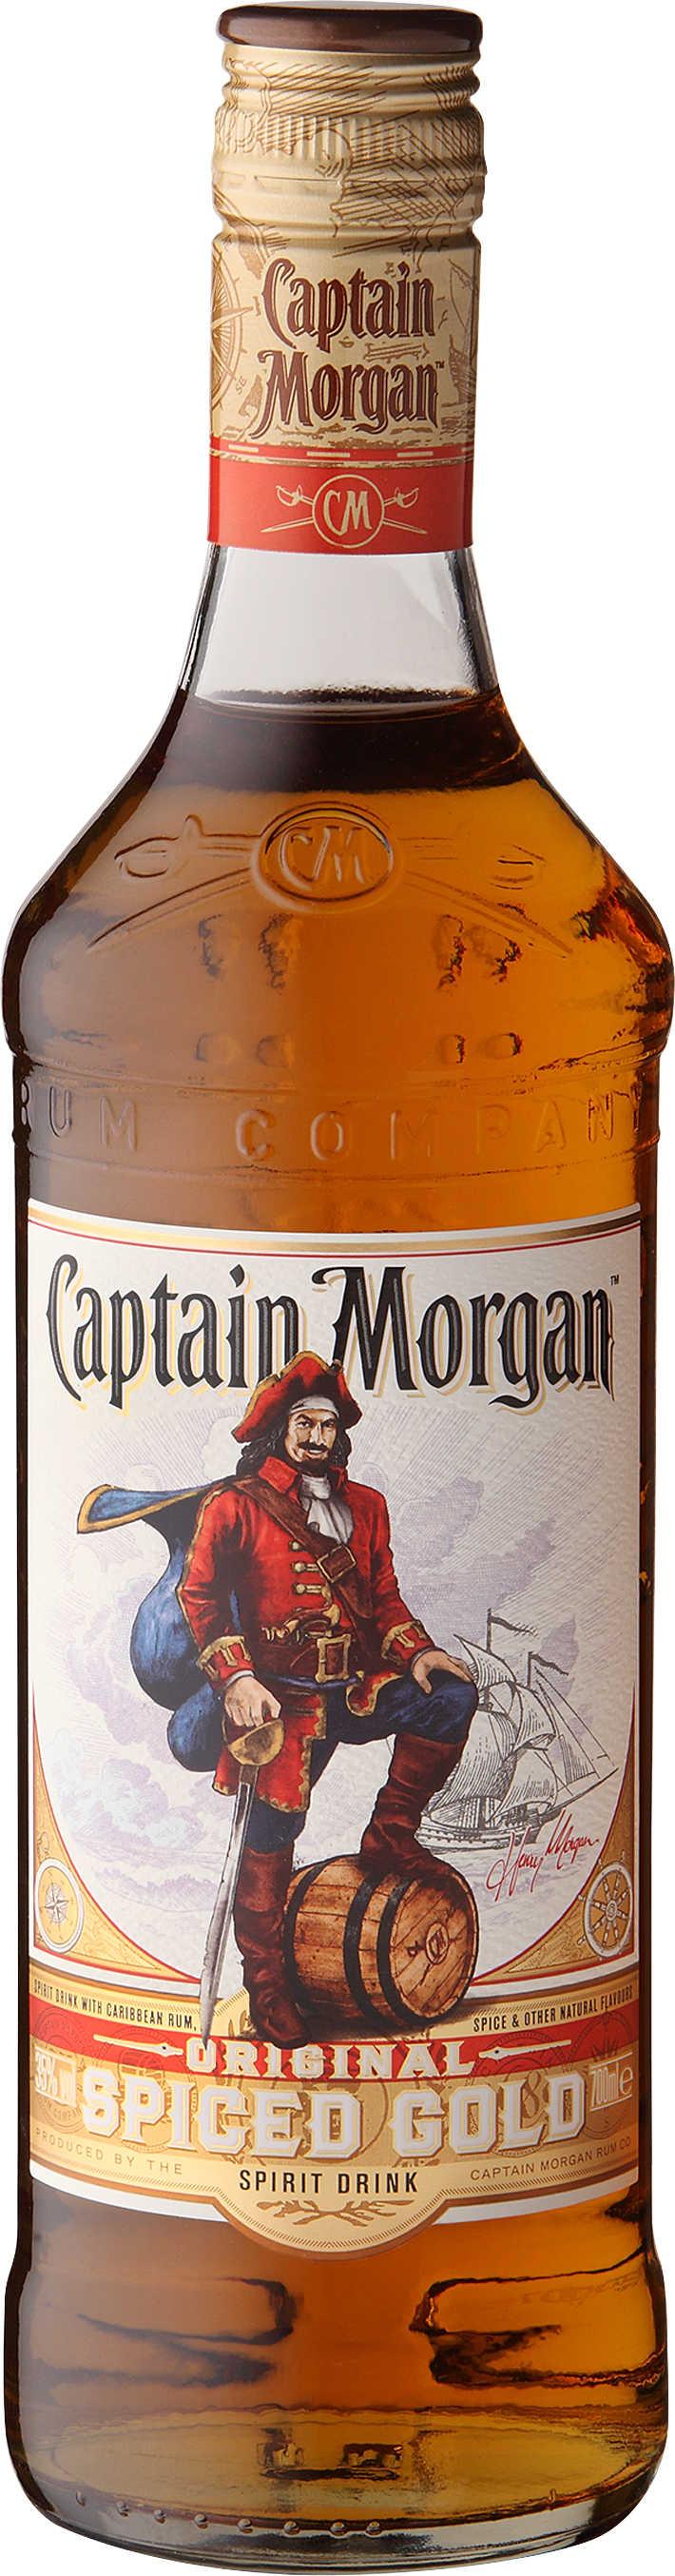 [Kaufland] Captain Morgan, 0,7L, 8,99€